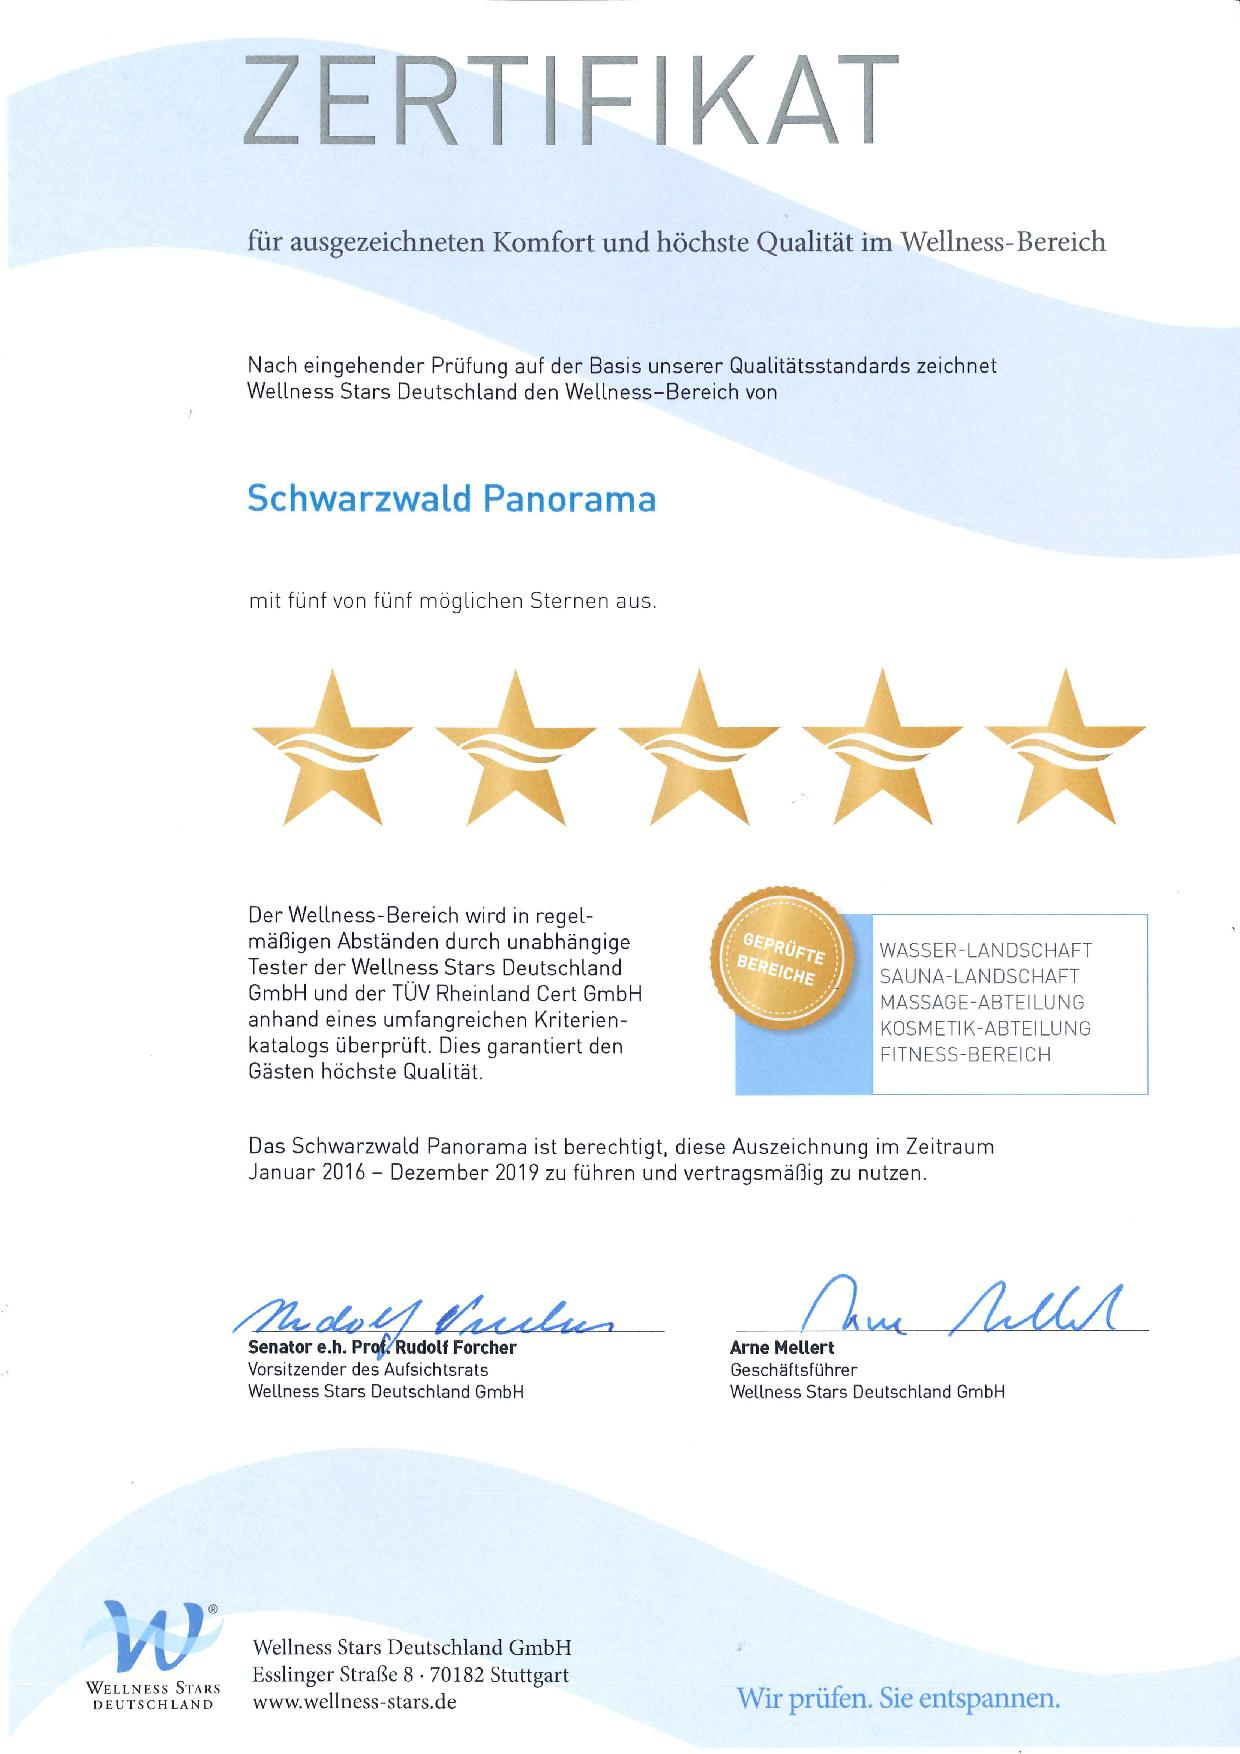 Zertifikat Wellness Stars GmbH 2014